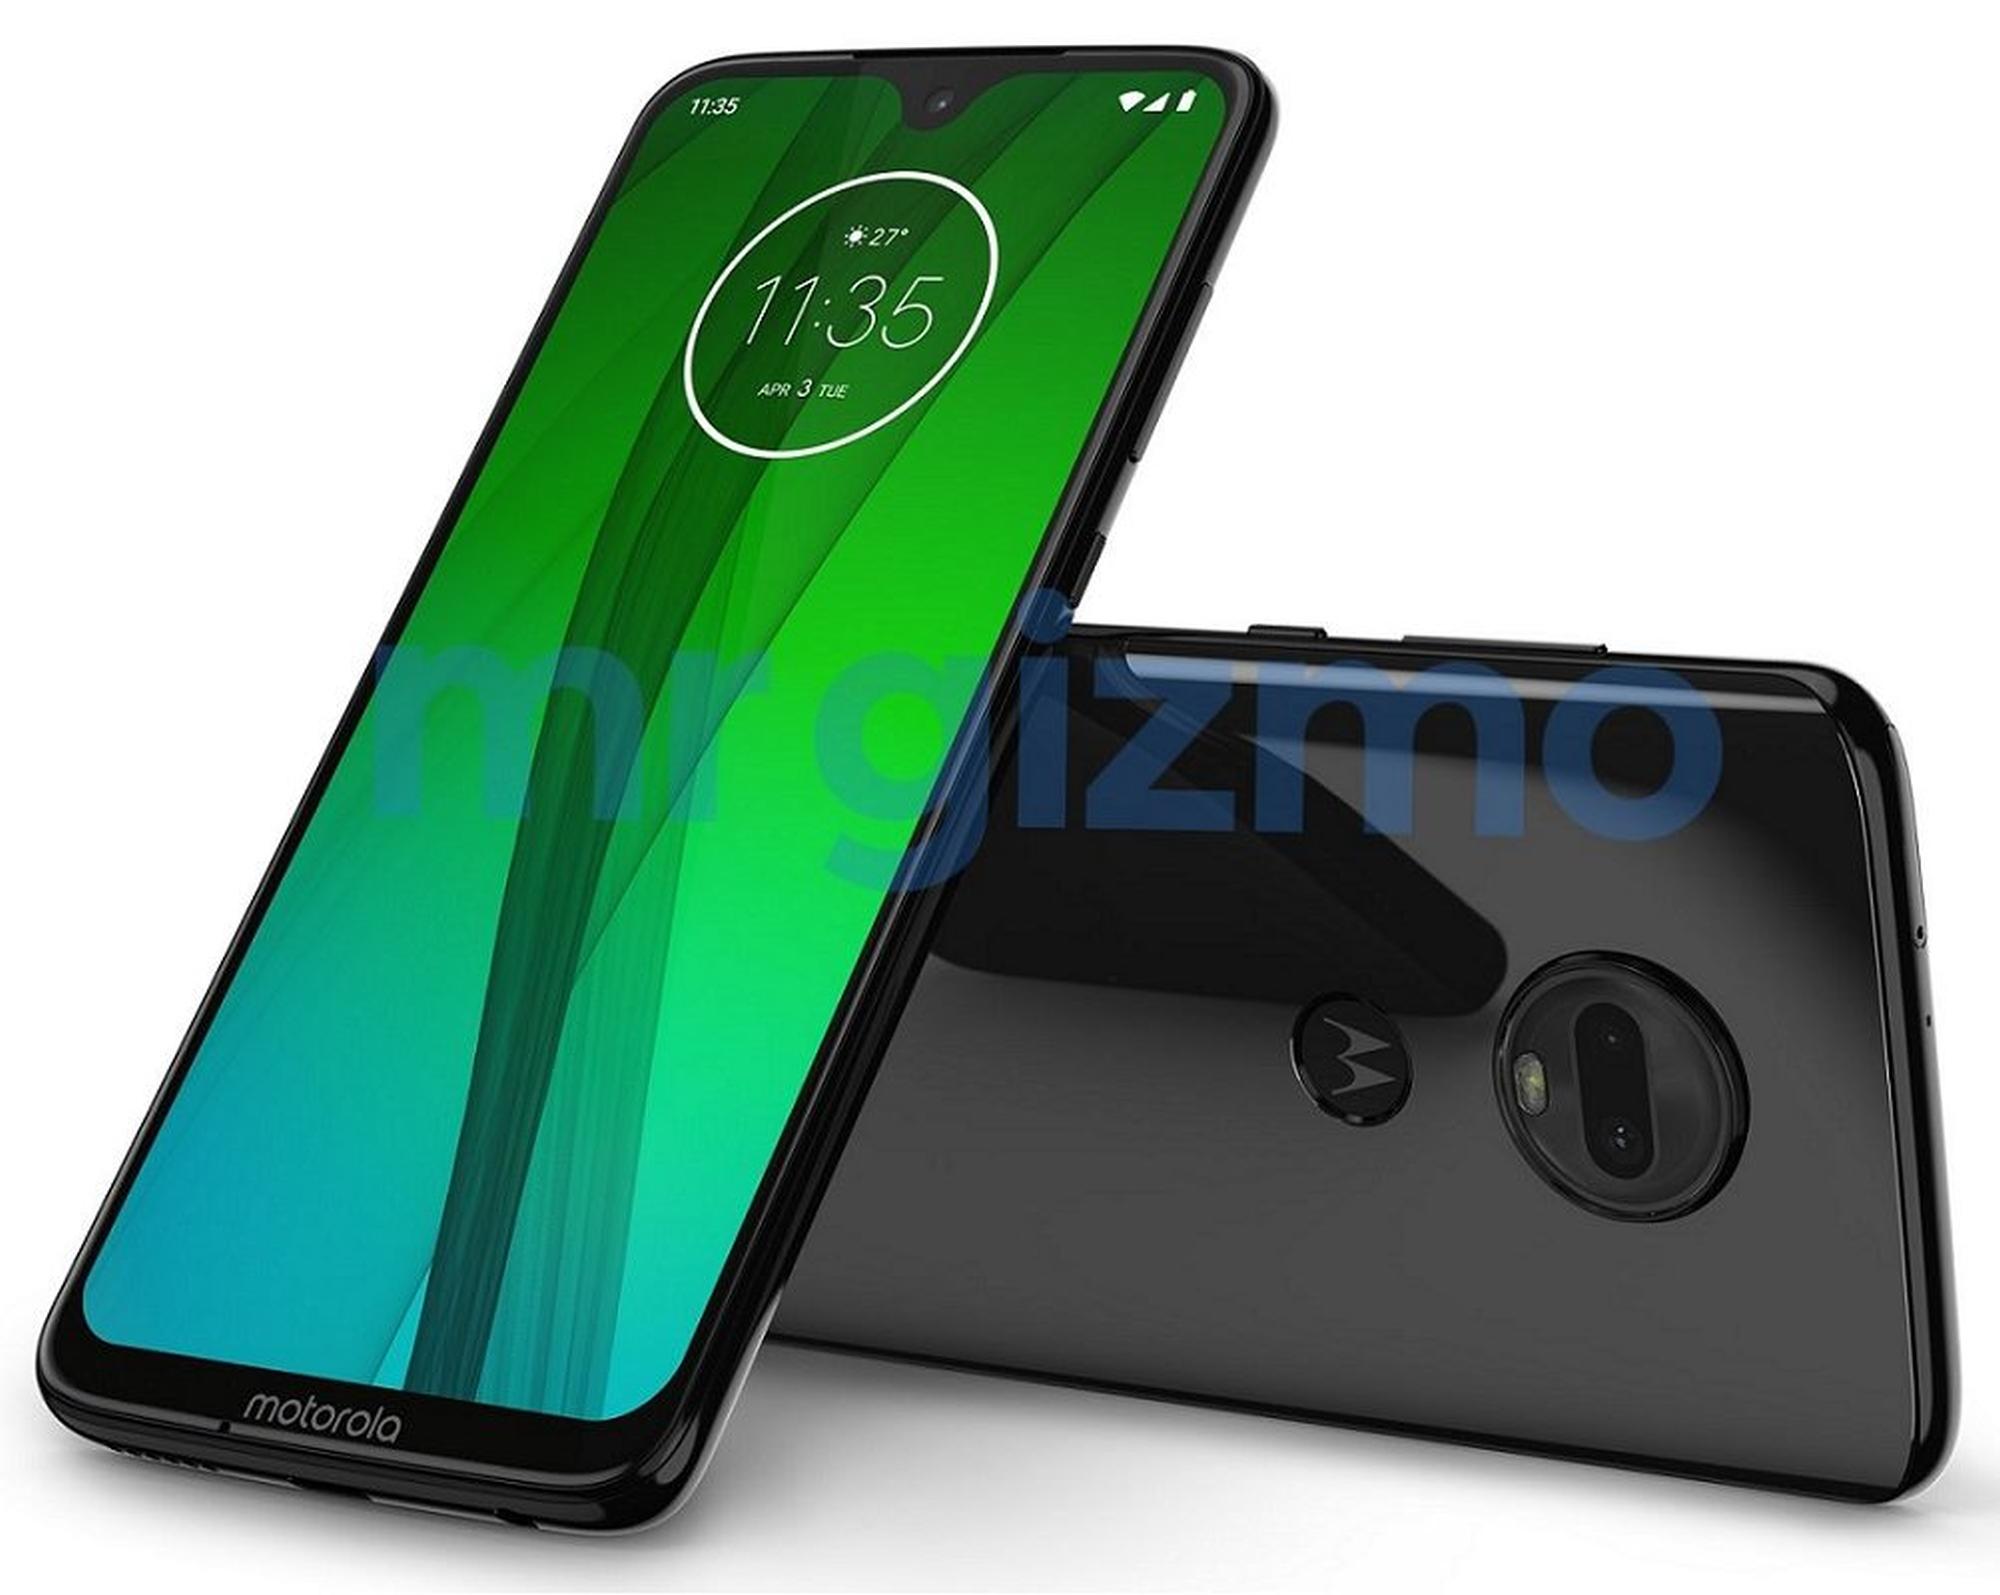 Leaked Moto G7 image renders reveal waterdrop notch and dual rear cameras